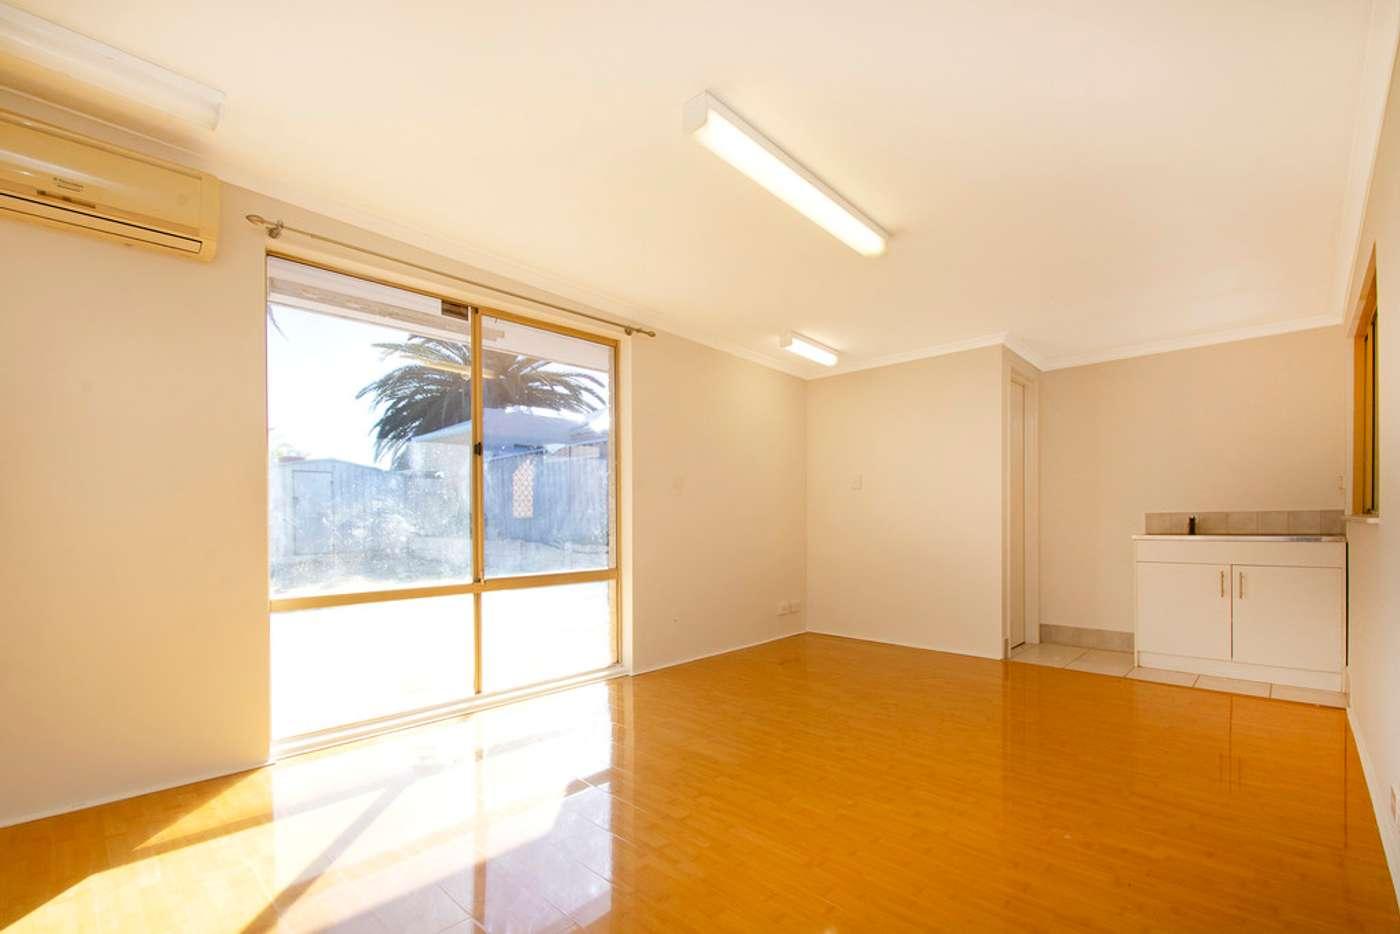 Sixth view of Homely house listing, 17 Pentecost Avenue, Beechboro WA 6063